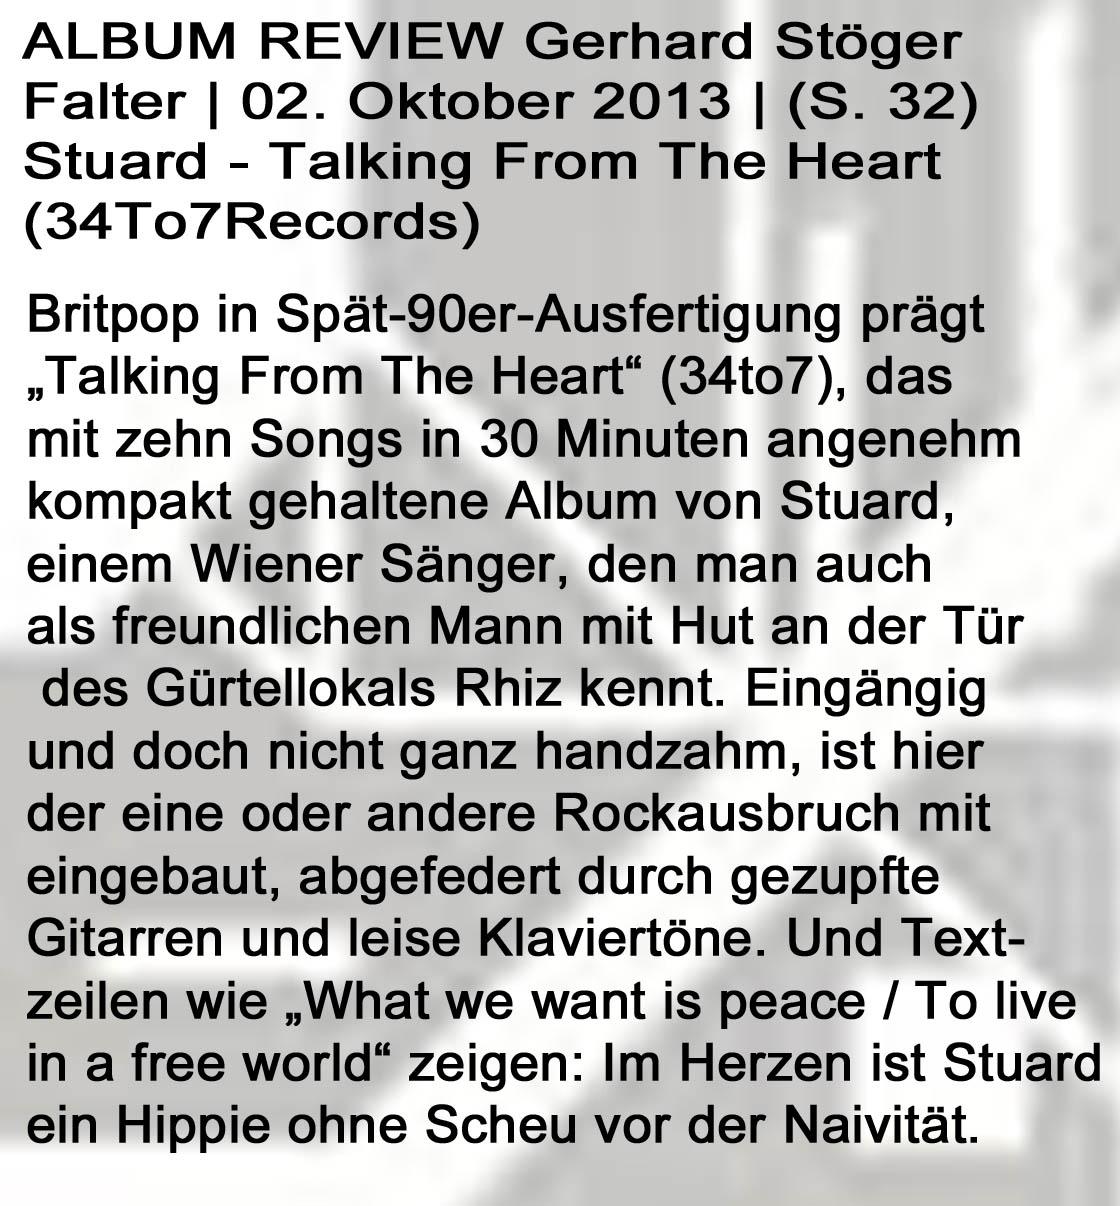 STU▲RD REVIEW Der Falter Gerhard Stöger